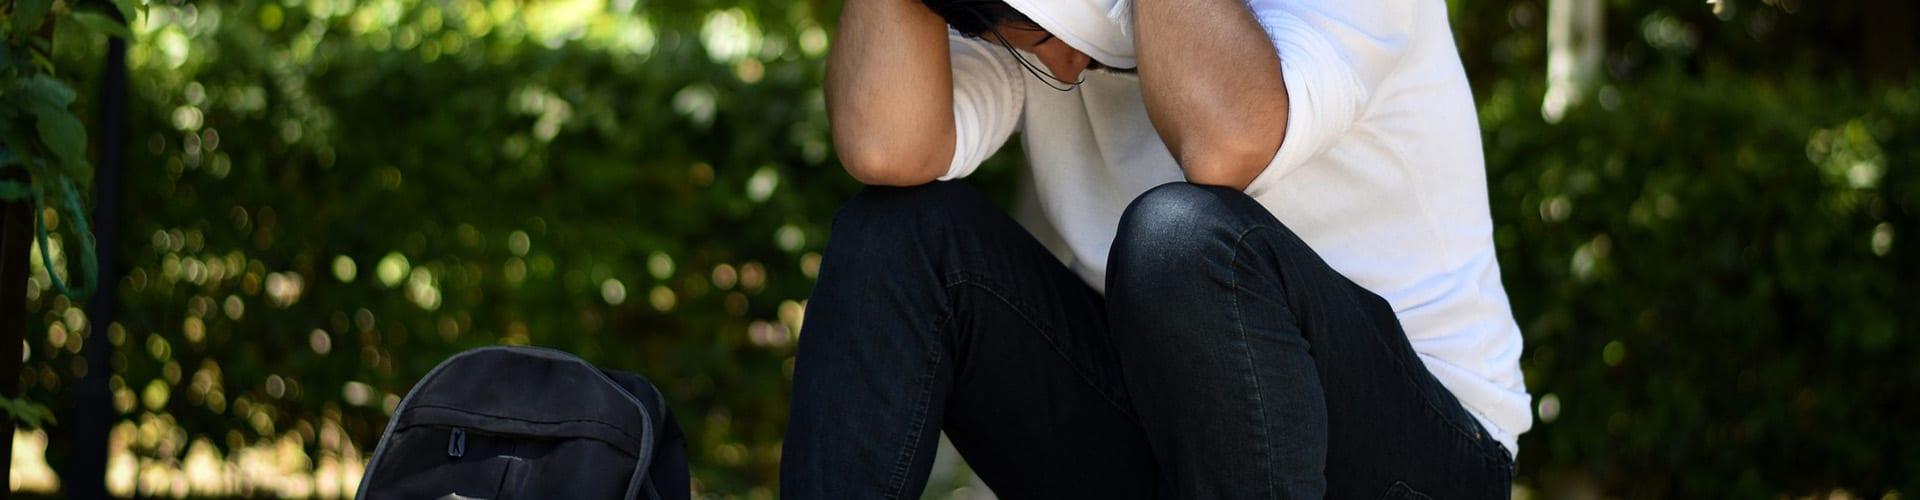 Terapia para las dificultades para socializar o tener interacción personal en Mallorca   Psicología   Clínica Ment